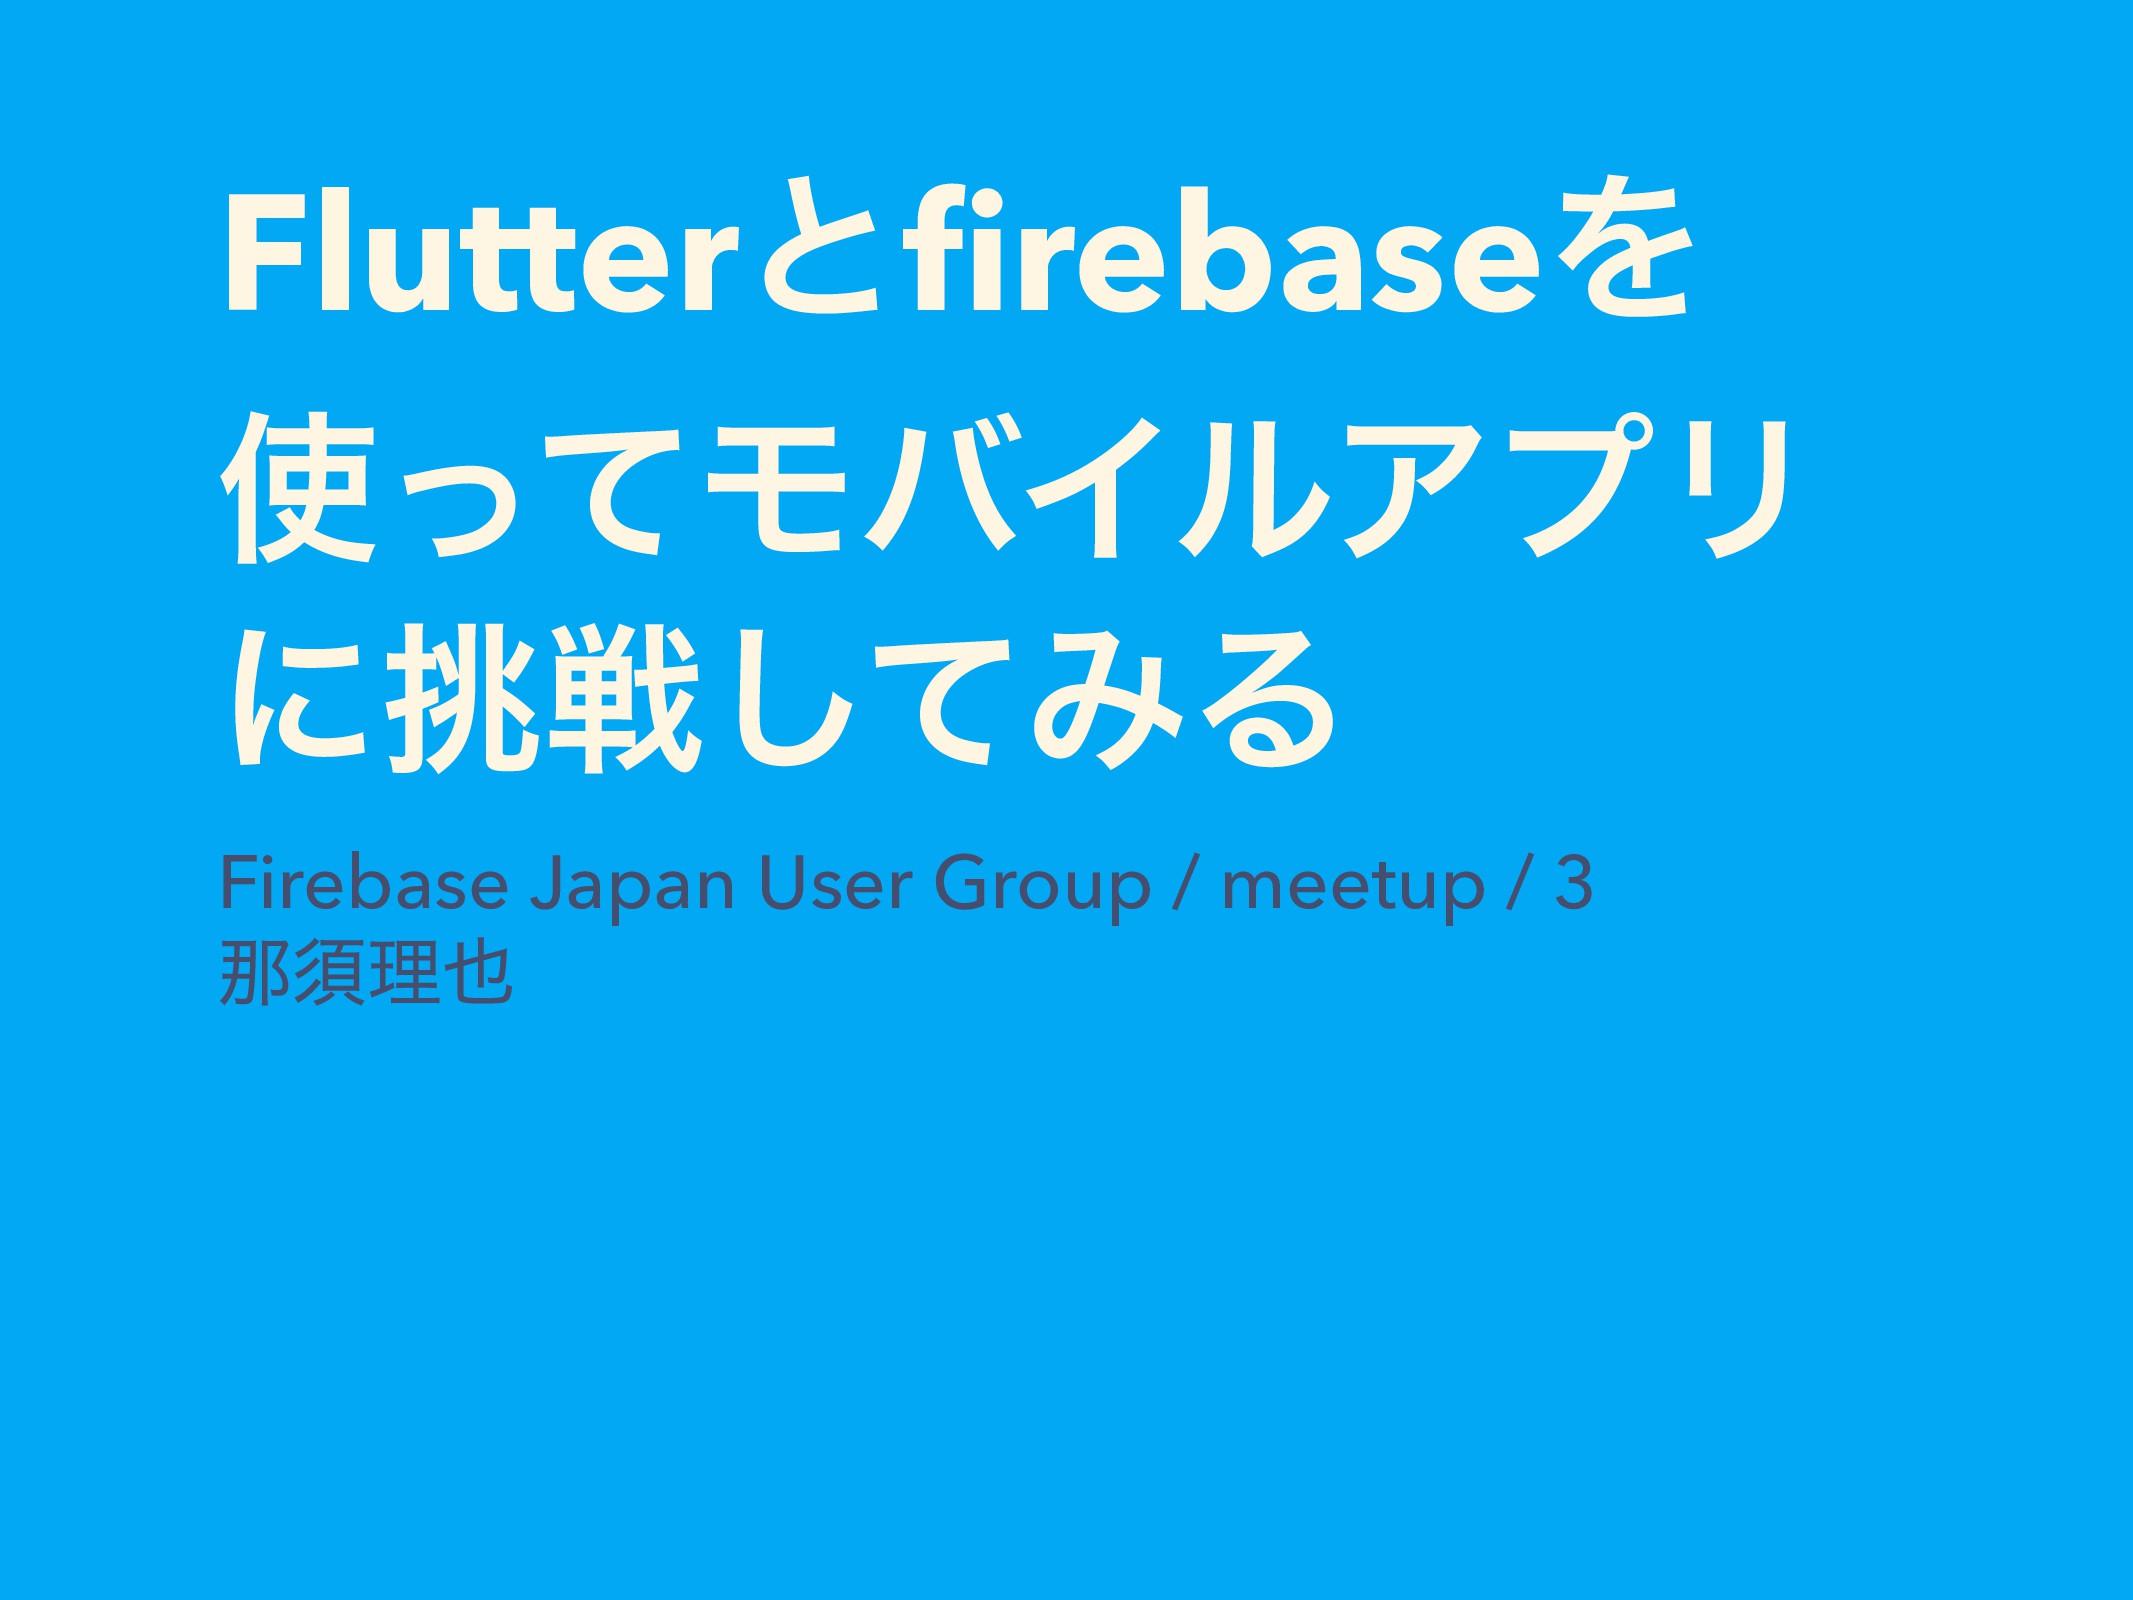 FlutterͱfirebaseΛ ͬͯϞόΠϧΞϓϦ ʹઓͯ͠ΈΔ Firebase Ja...